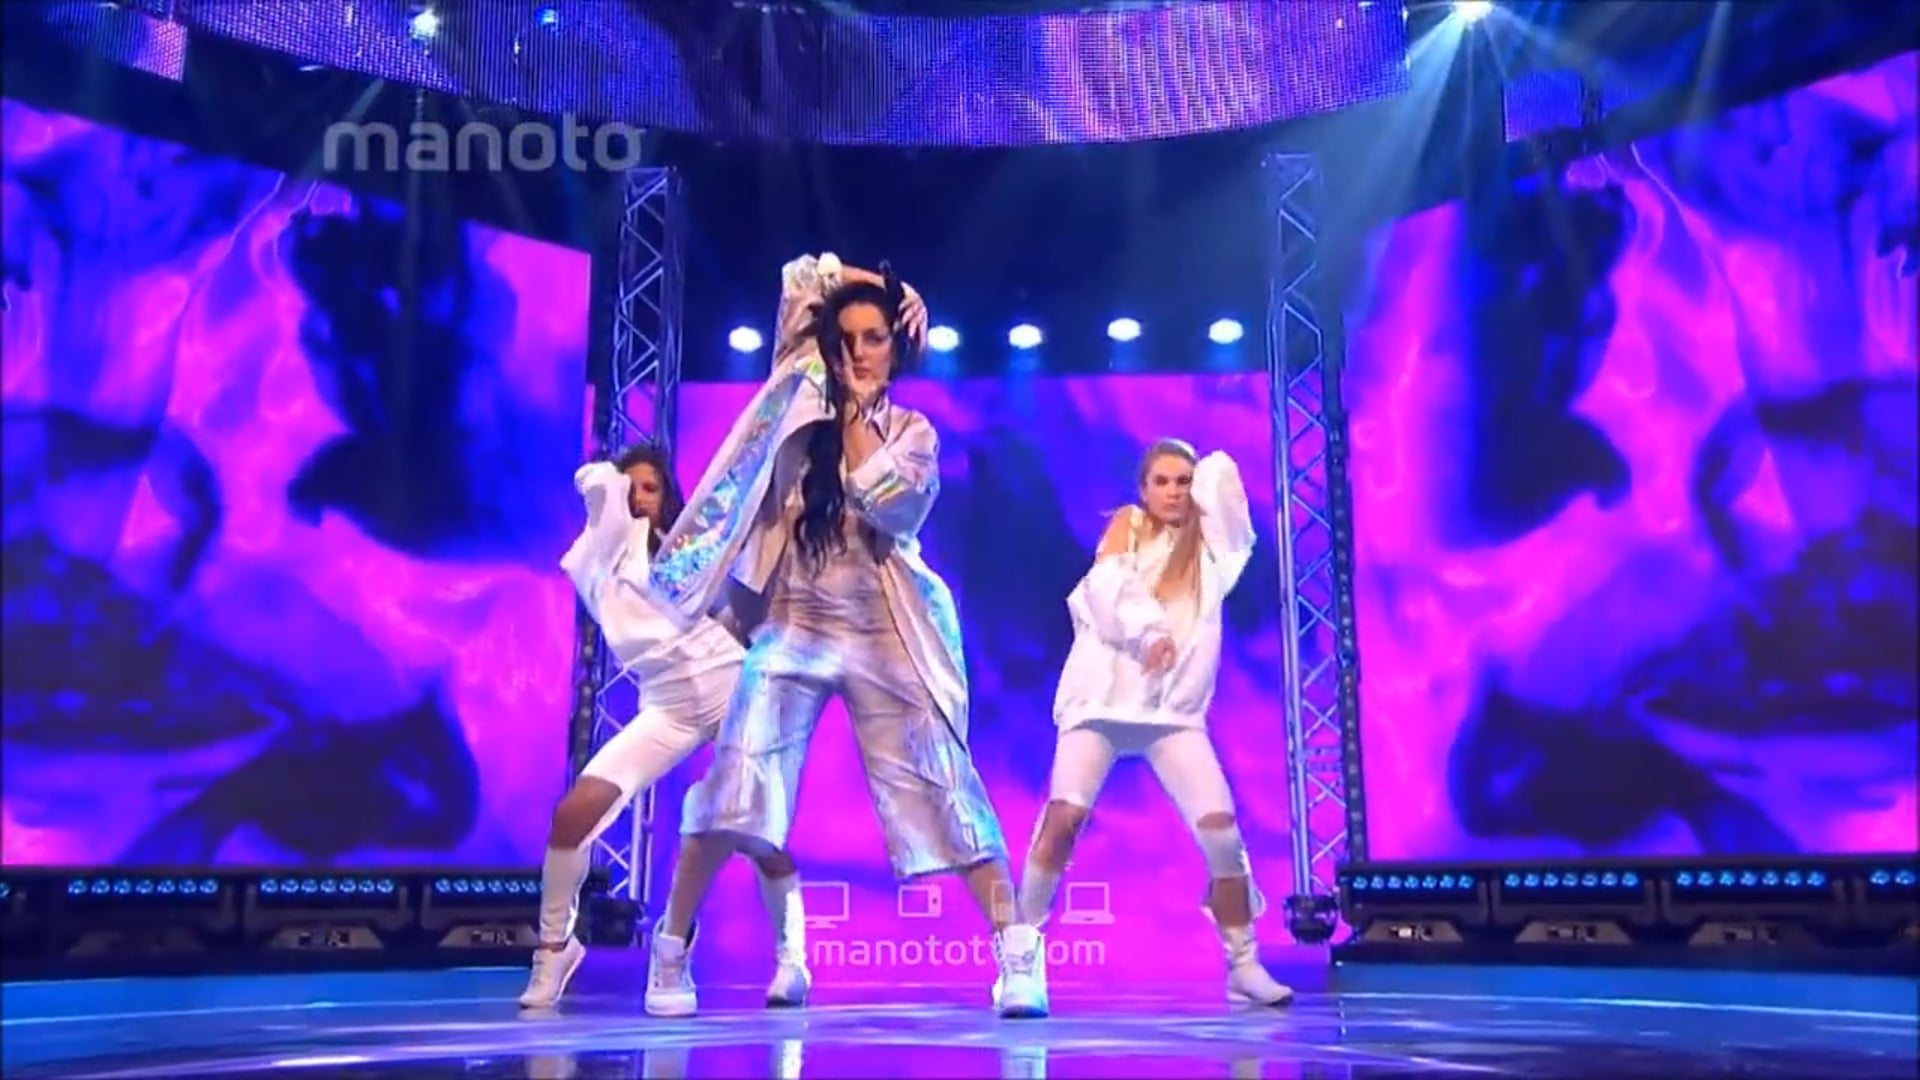 Nikita's Performance Final Manoto